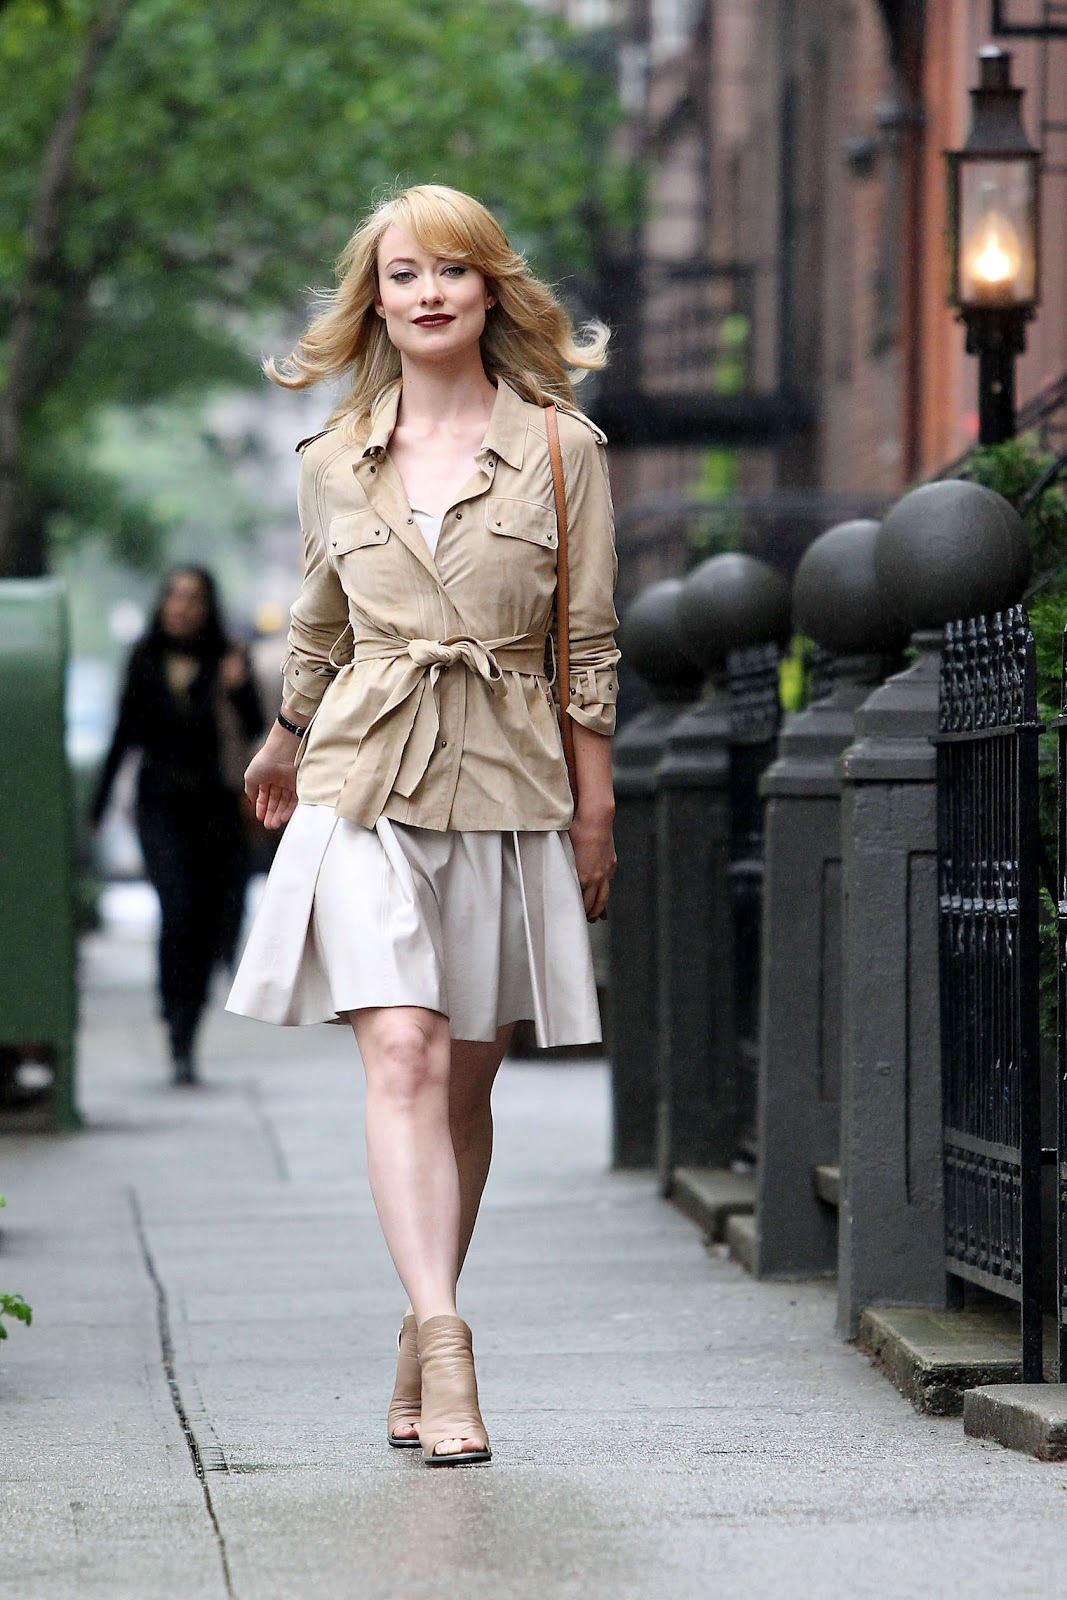 http://1.bp.blogspot.com/-DfZYsIWB8ok/T6WB19nA8EI/AAAAAAAAERc/LXDdiHUusJk/s1600/OLIVIA-WILDE-Revlon-commercial-NY-02.jpg